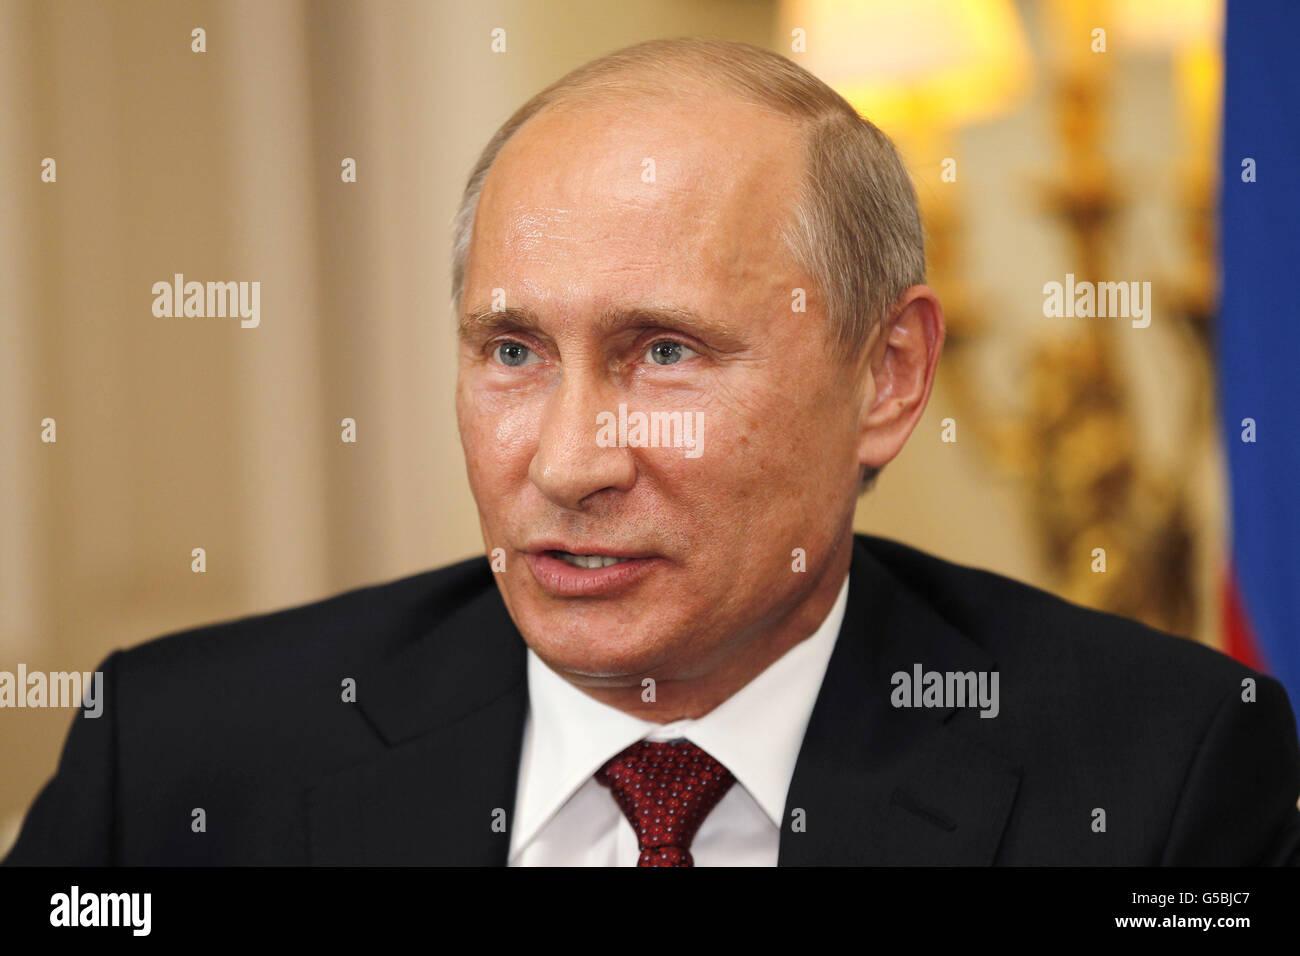 Putin visits UK - Stock Image